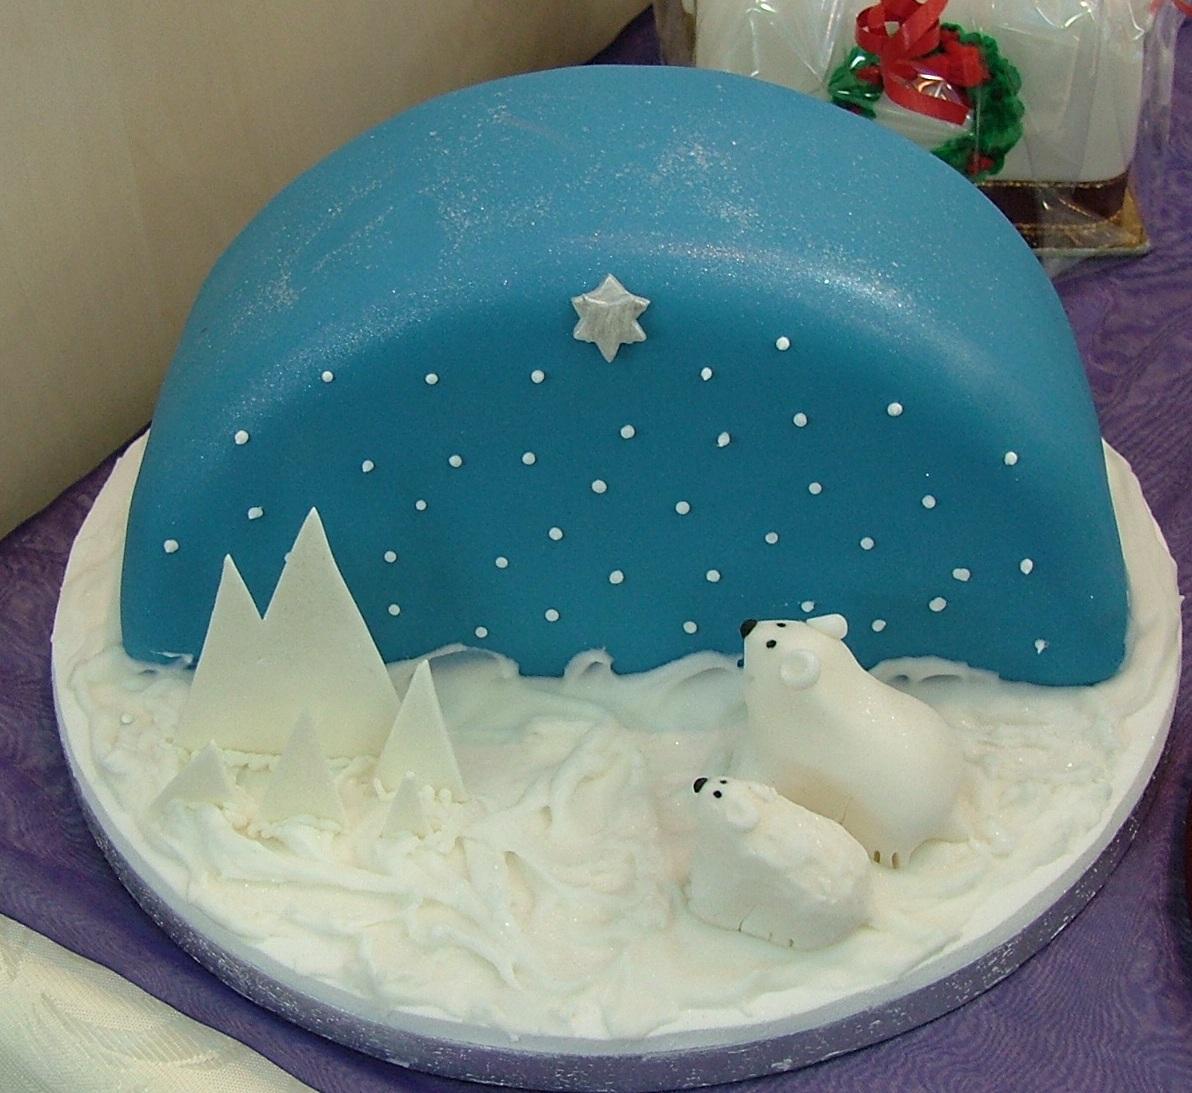 Seasonal Cakes Too Nice To Slice